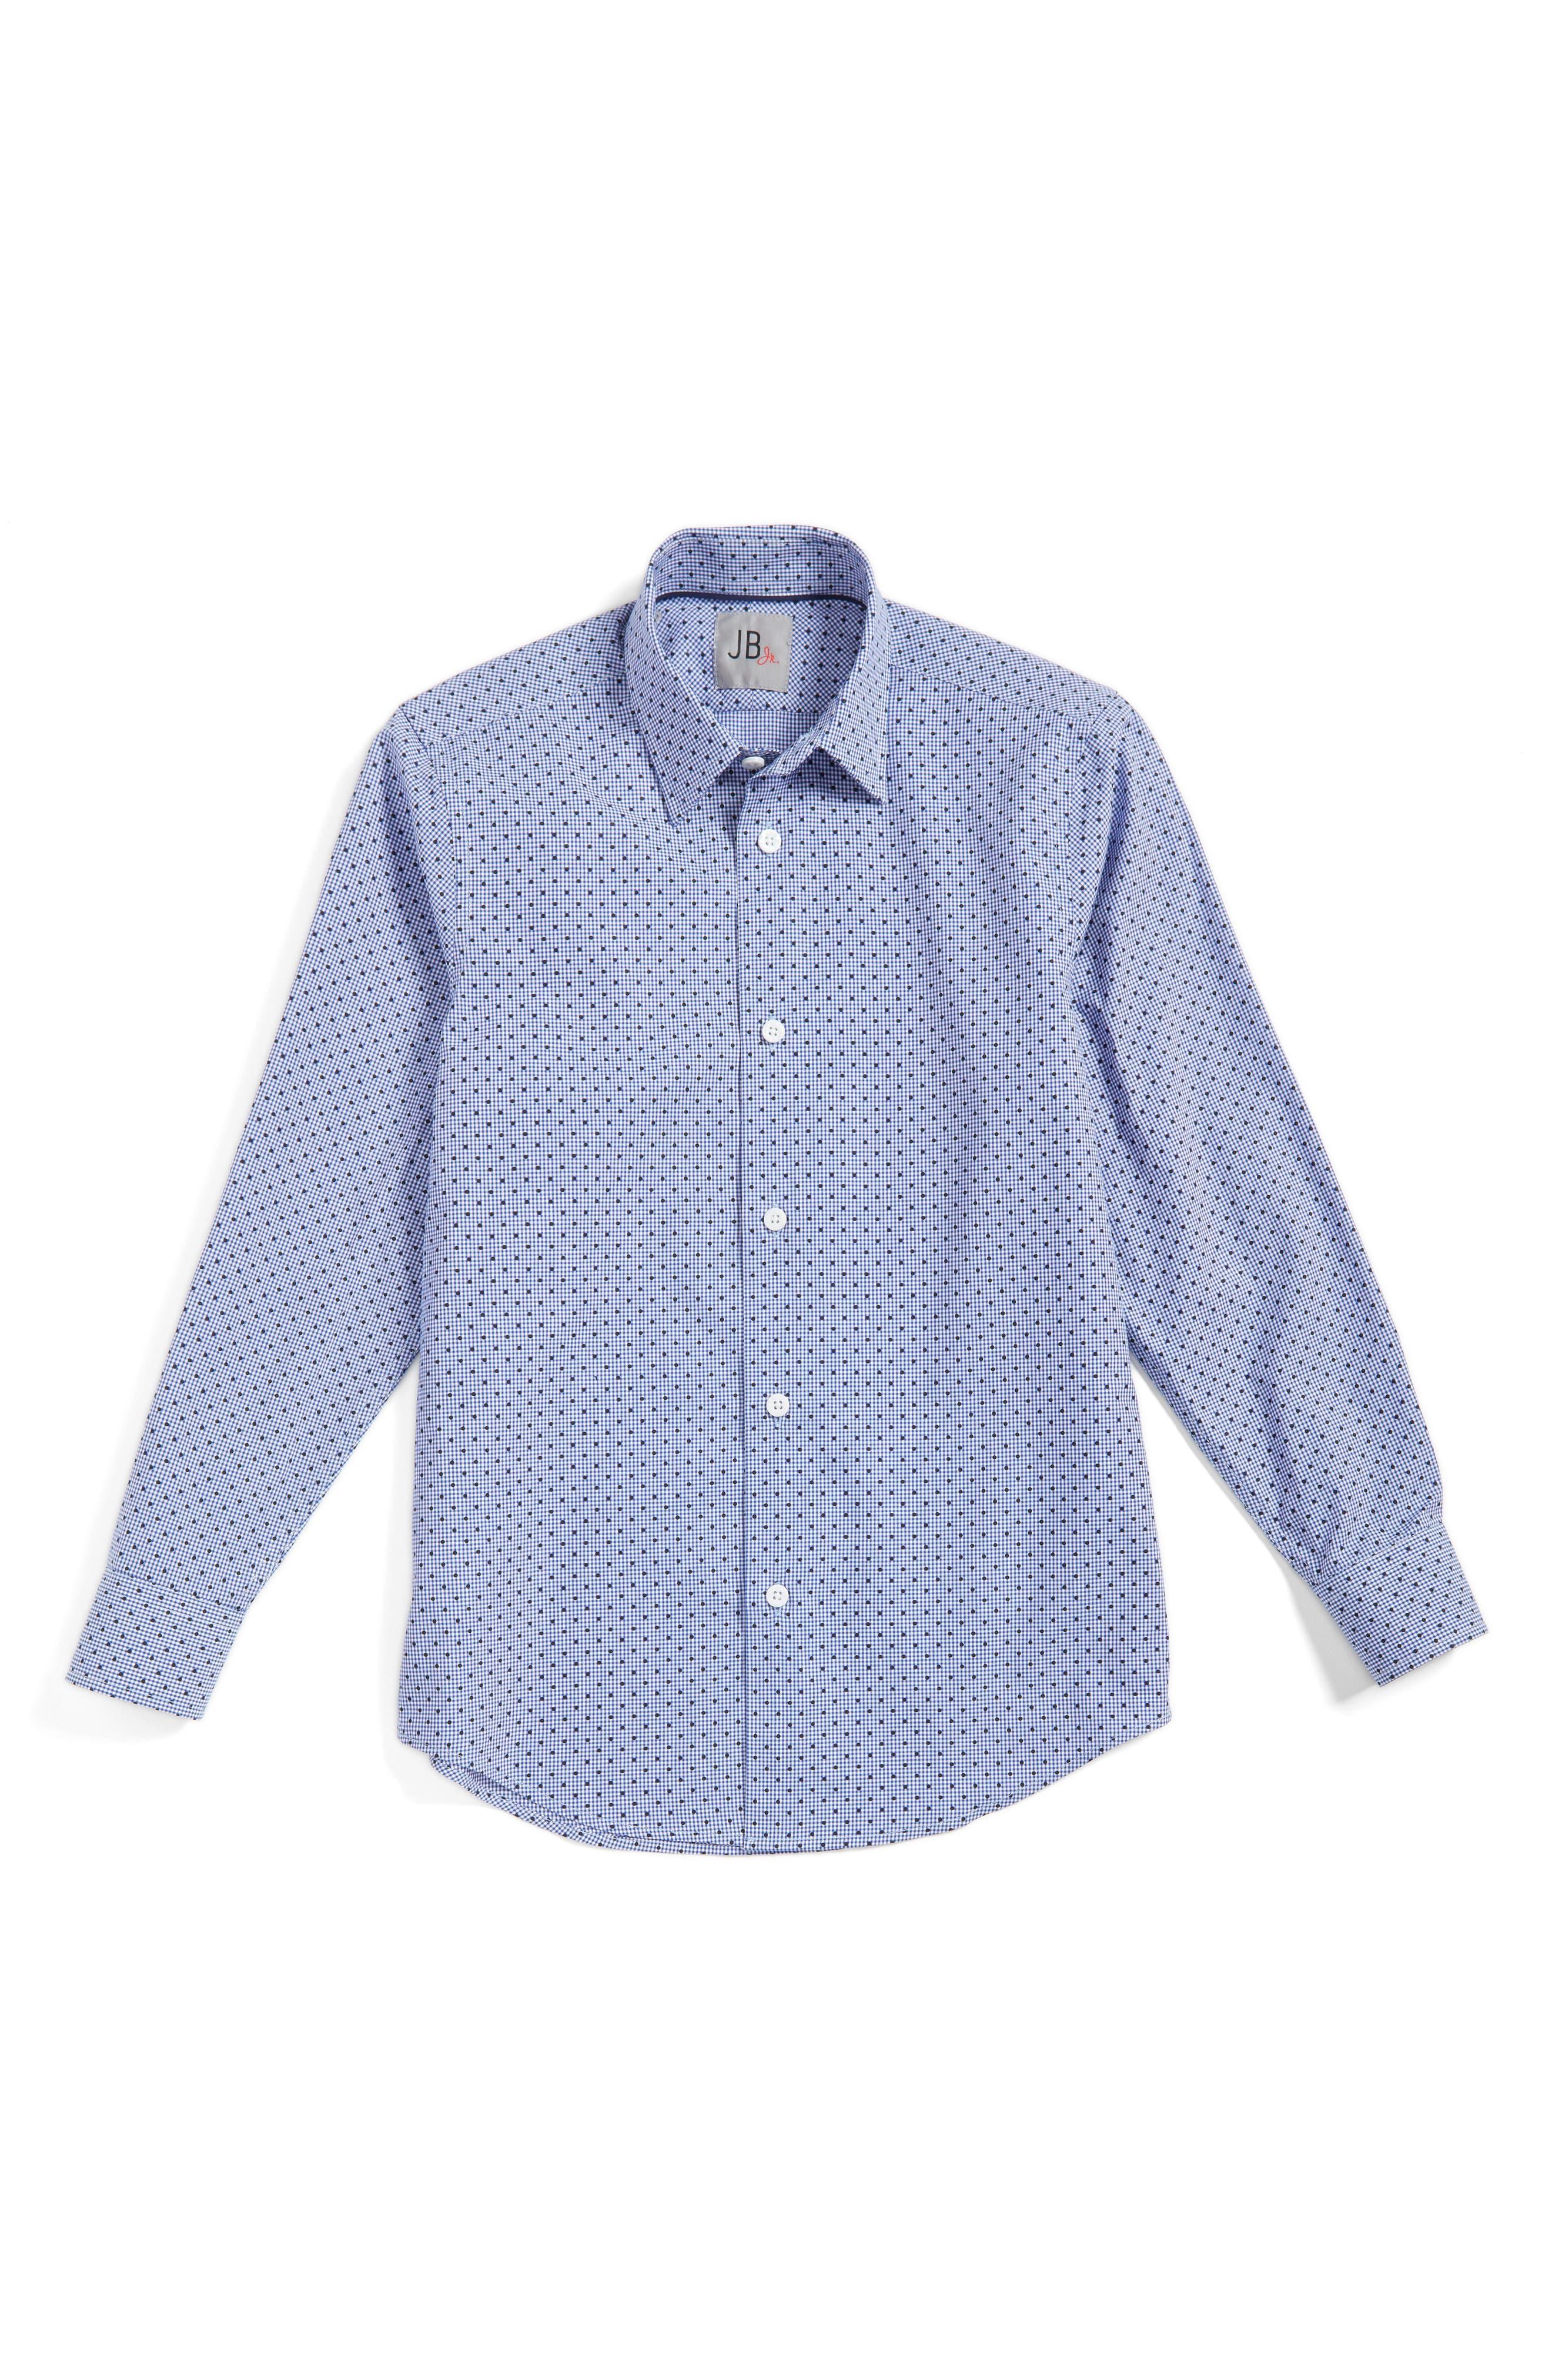 JB JR Dot Gingham Dress Shirt